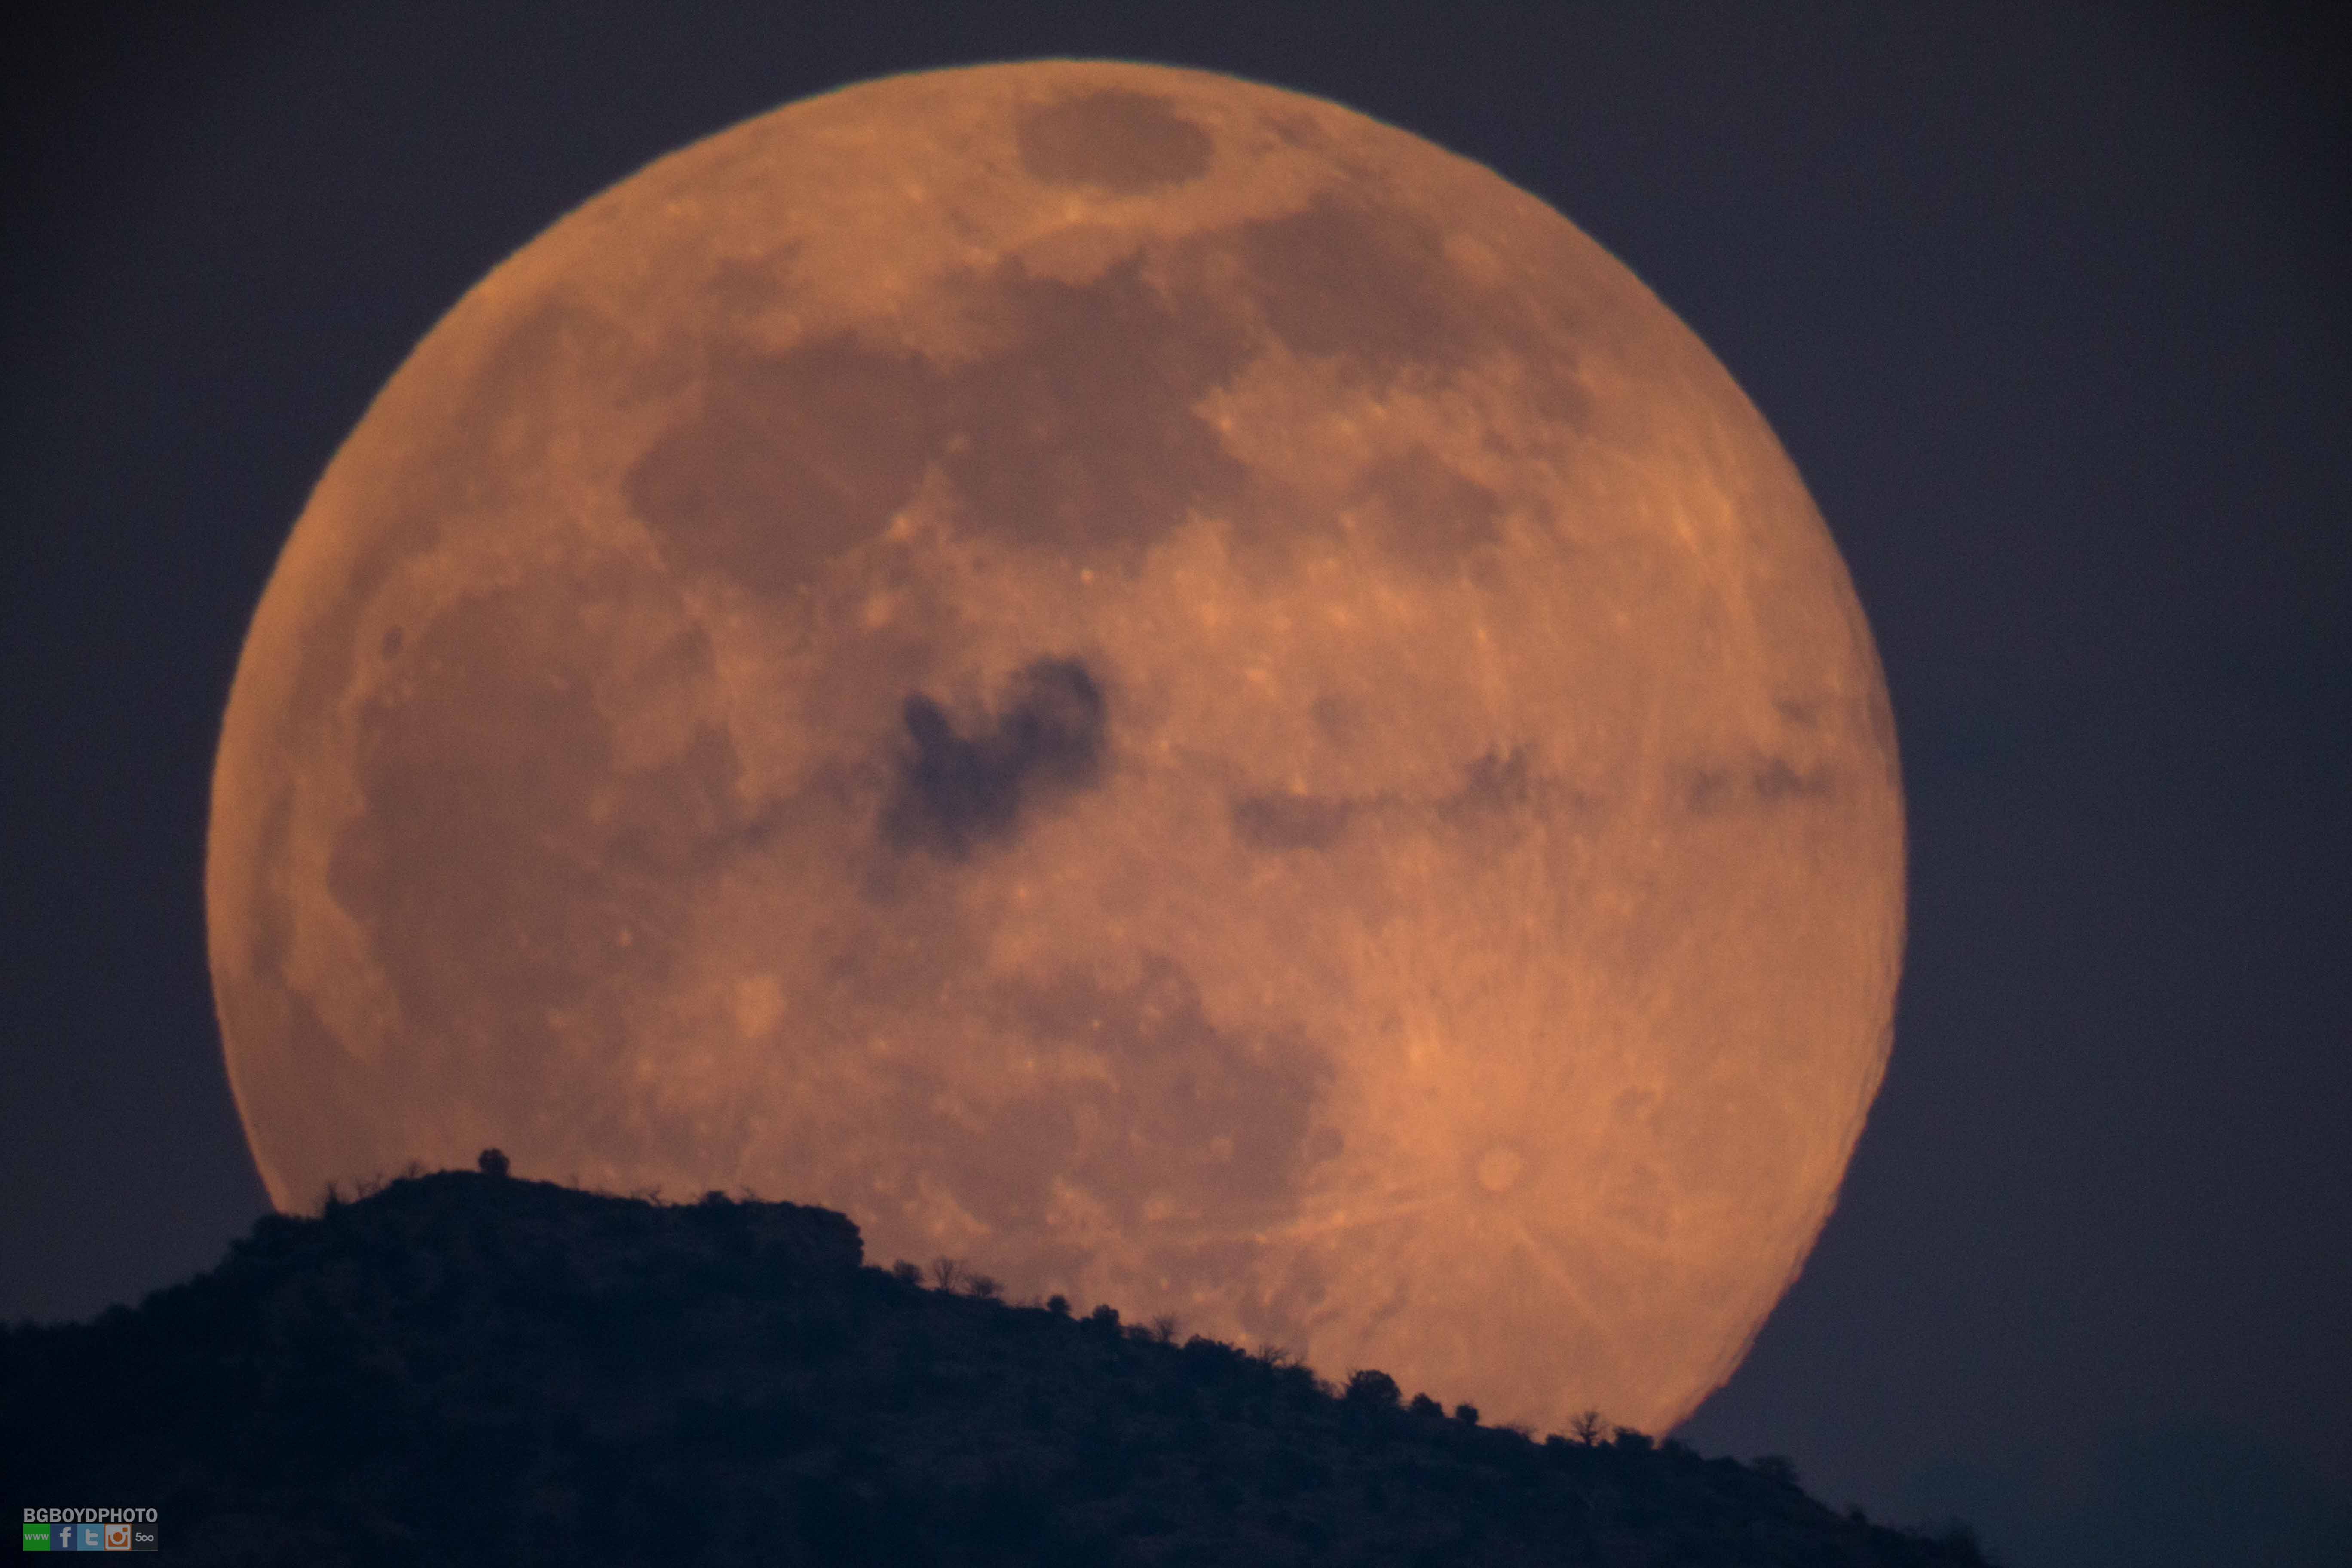 friday the 13th full moon 2020